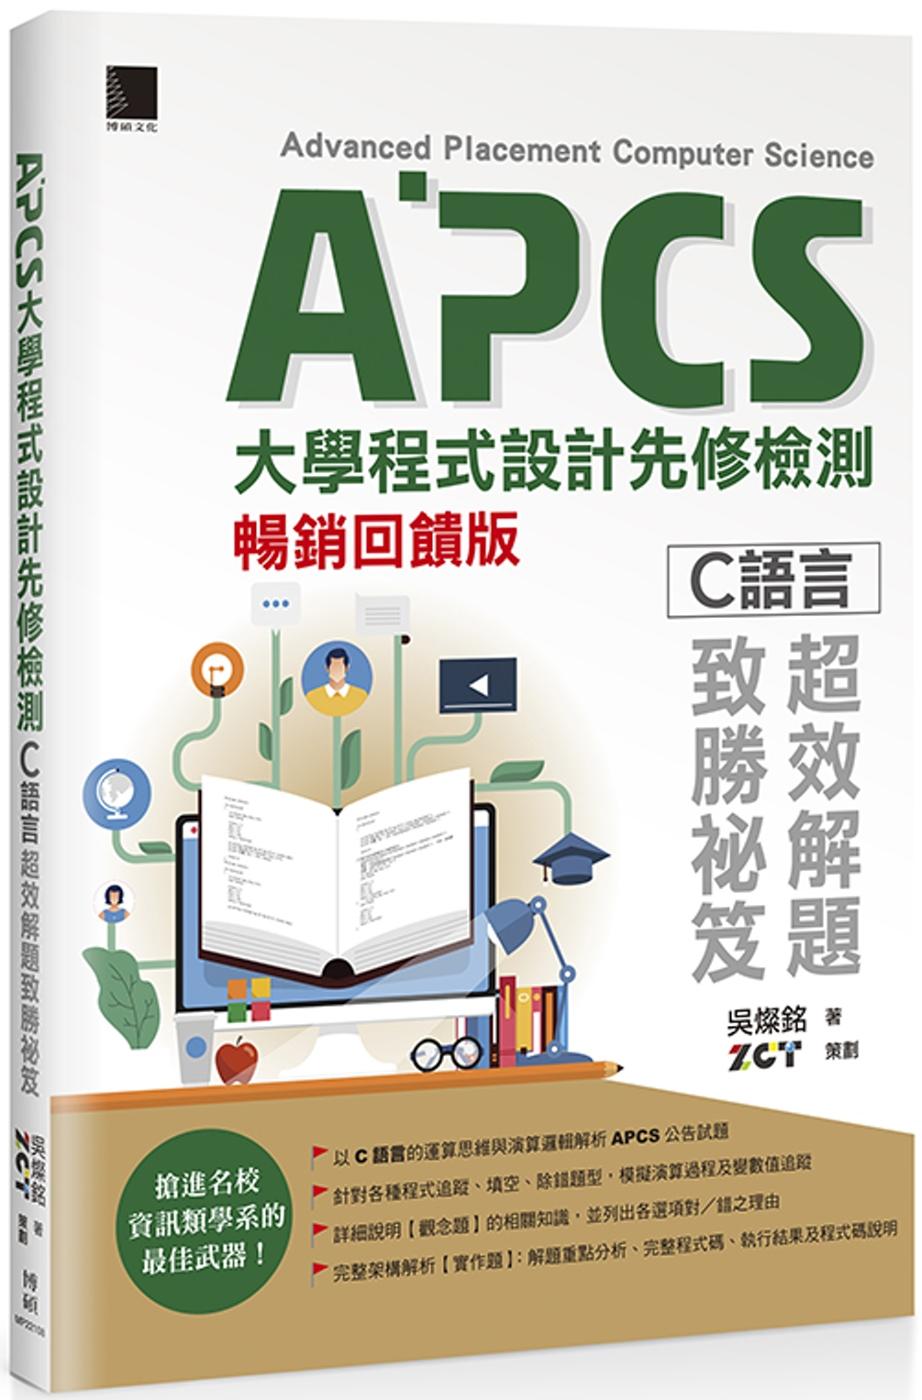 APCS大學程式設計先修檢測:...